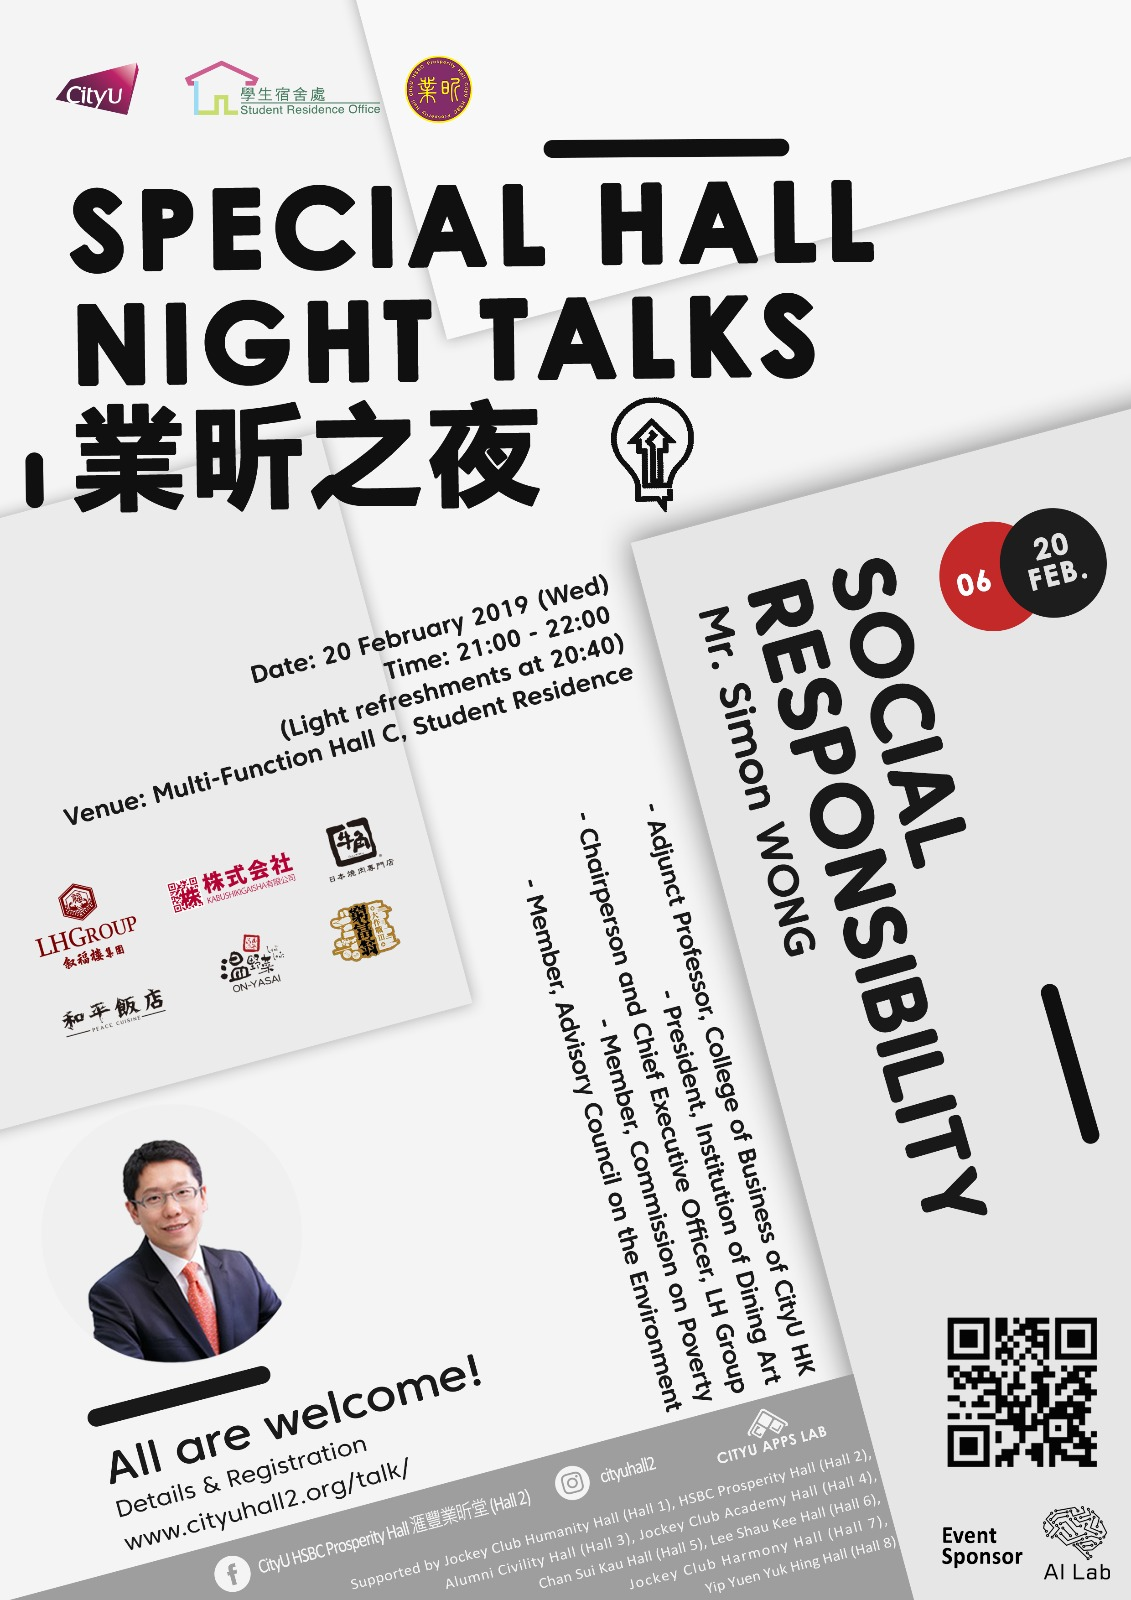 SPECIAL Hall Night Talks – CityU HSBC Prosperity Hall